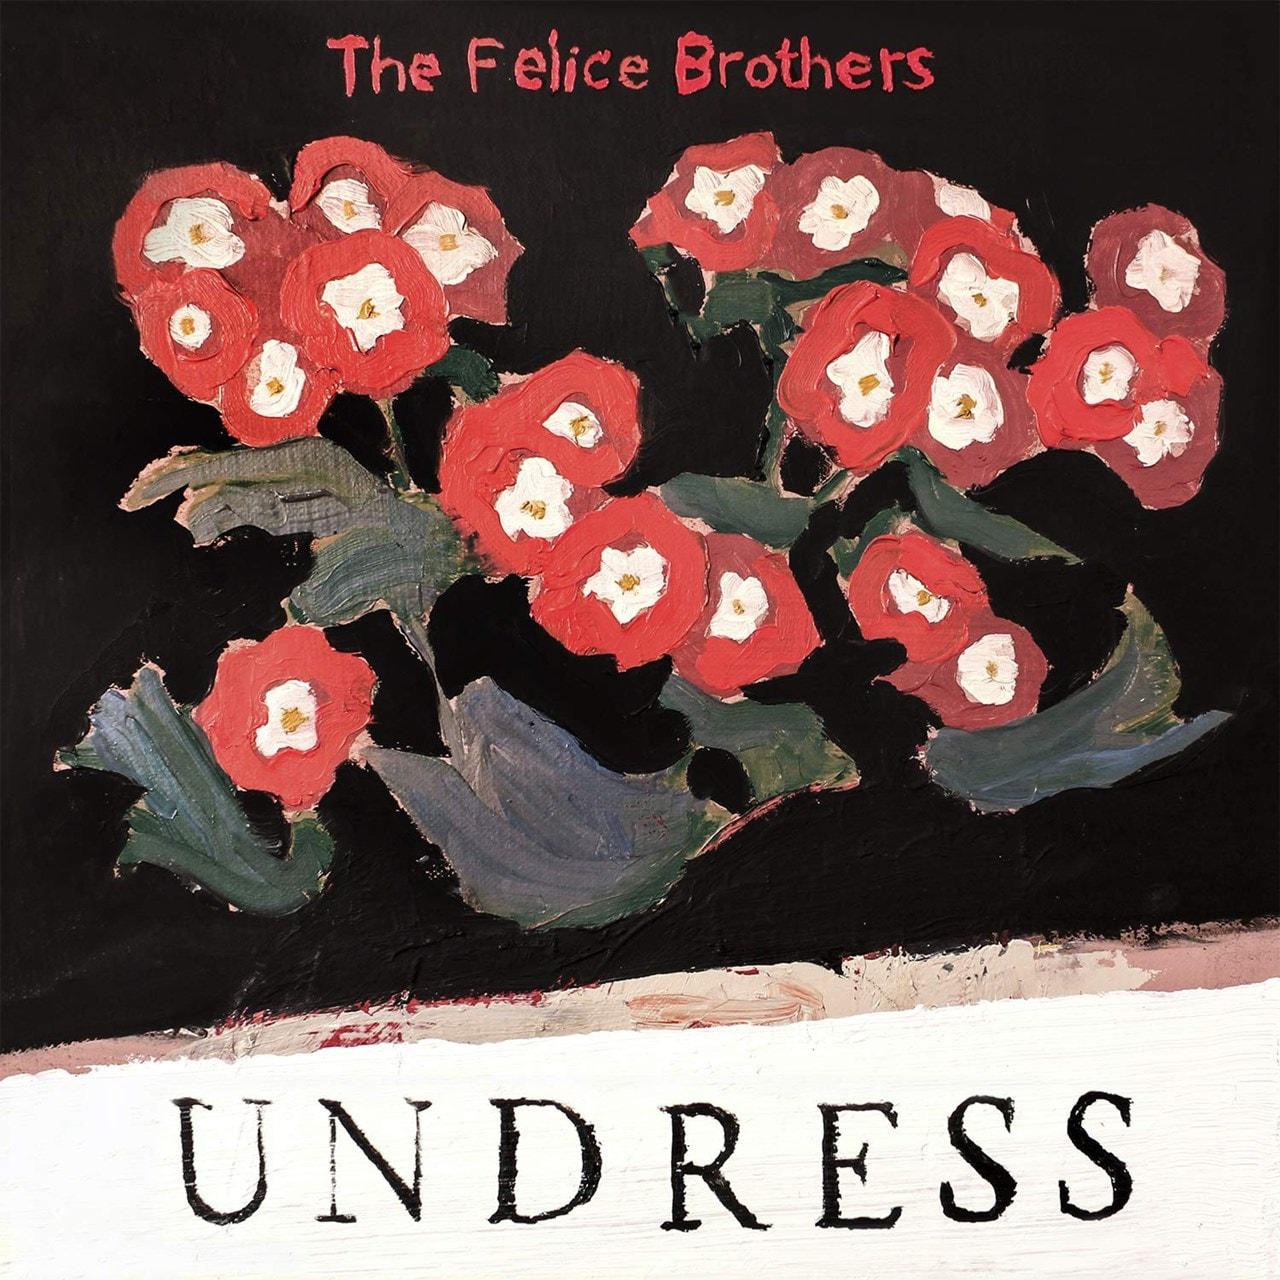 Undress - 1